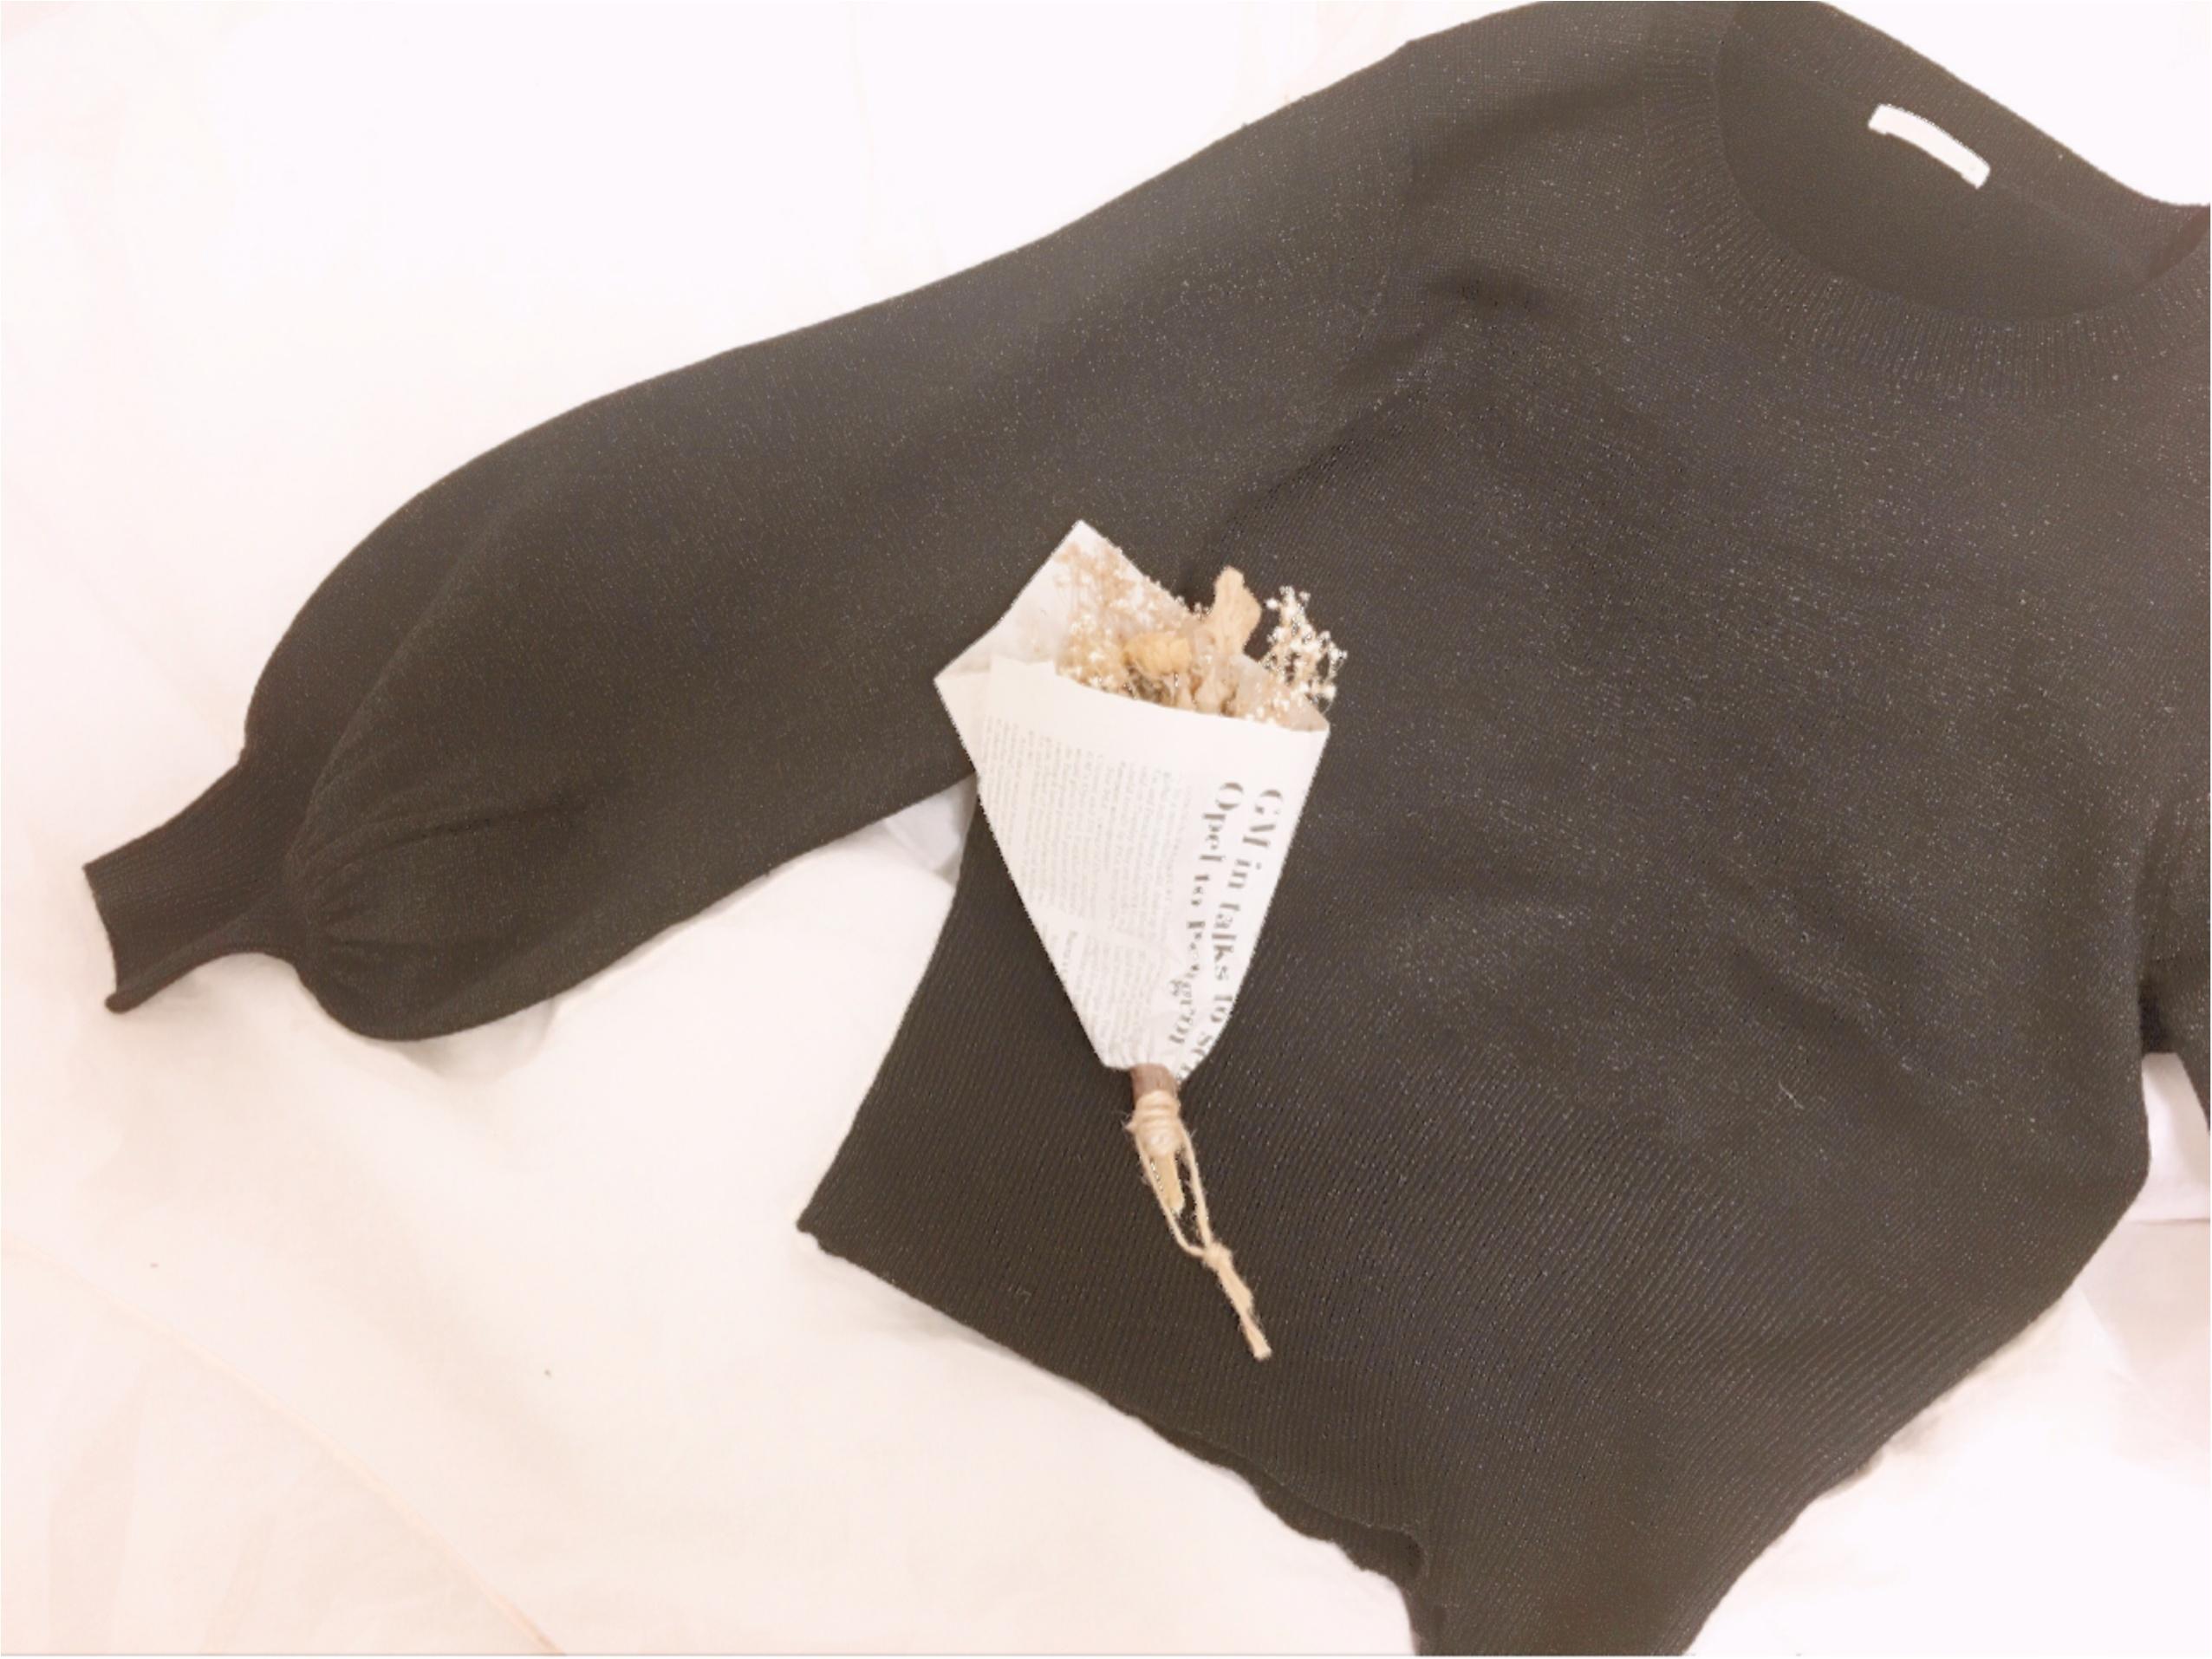 【GU】『ラメパフスリーブセーター』は、あまり取り上げられていない隠れヒット服!_2